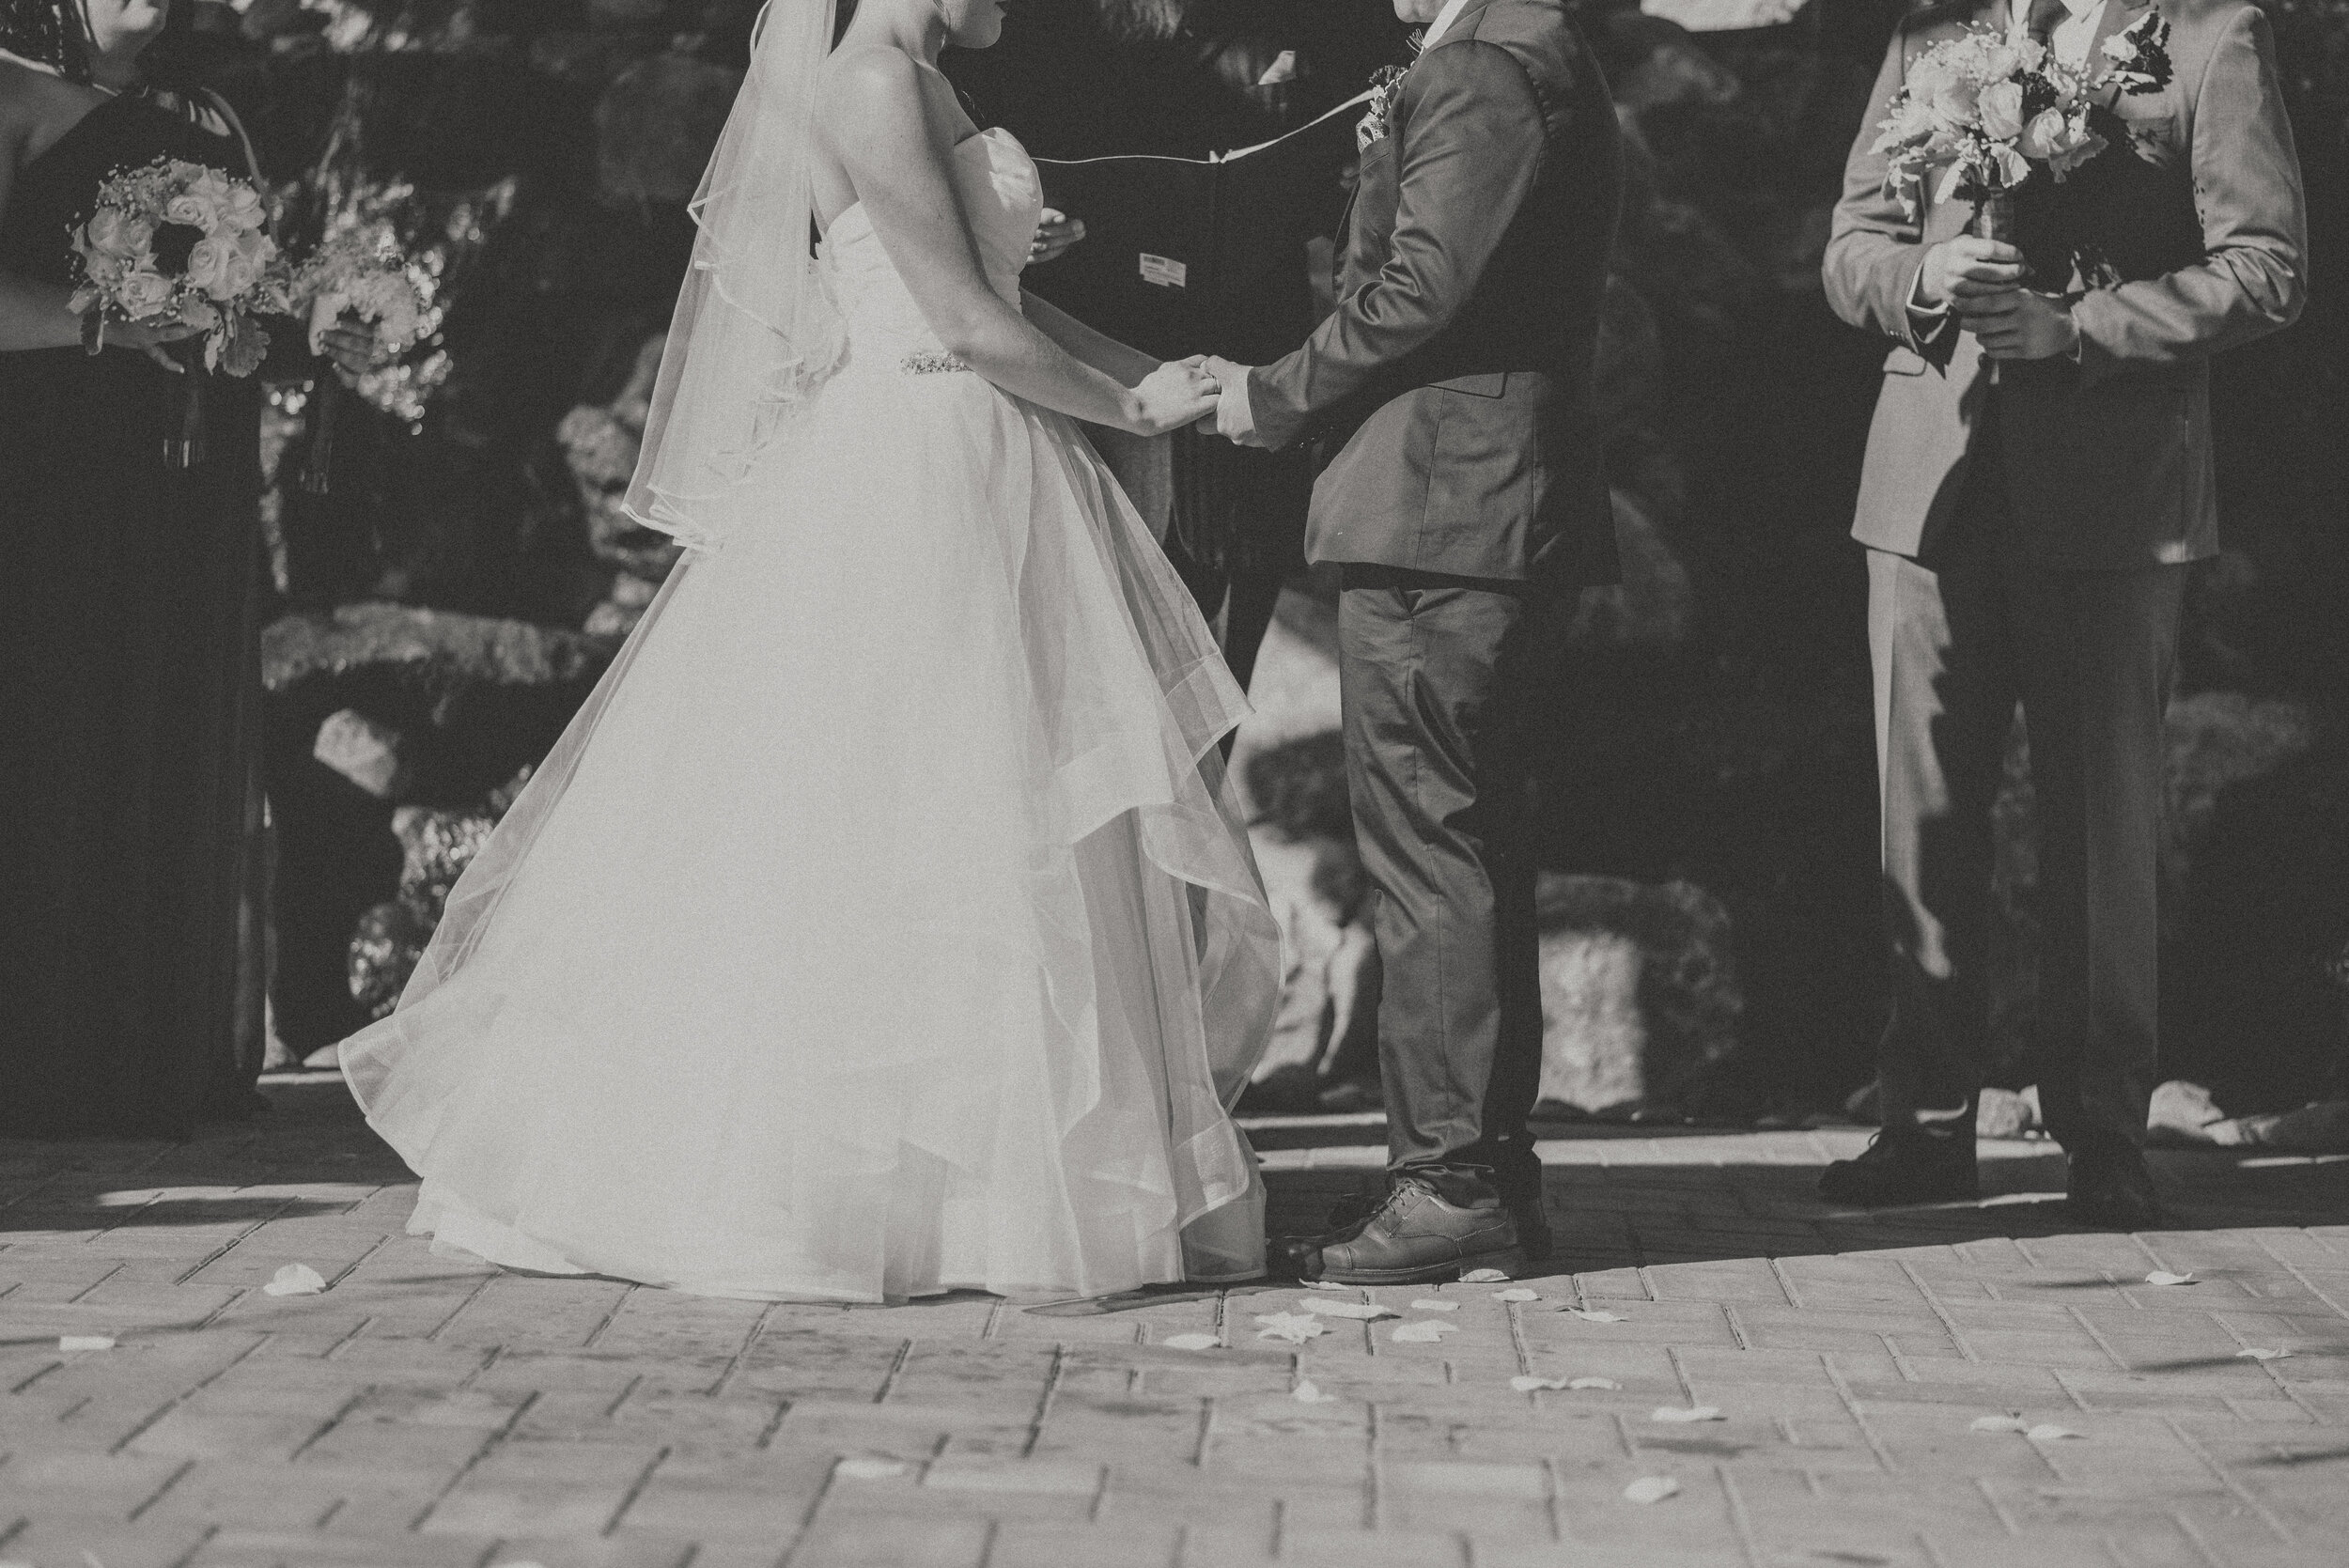 Joei & Betty - Ceremony-40.jpg